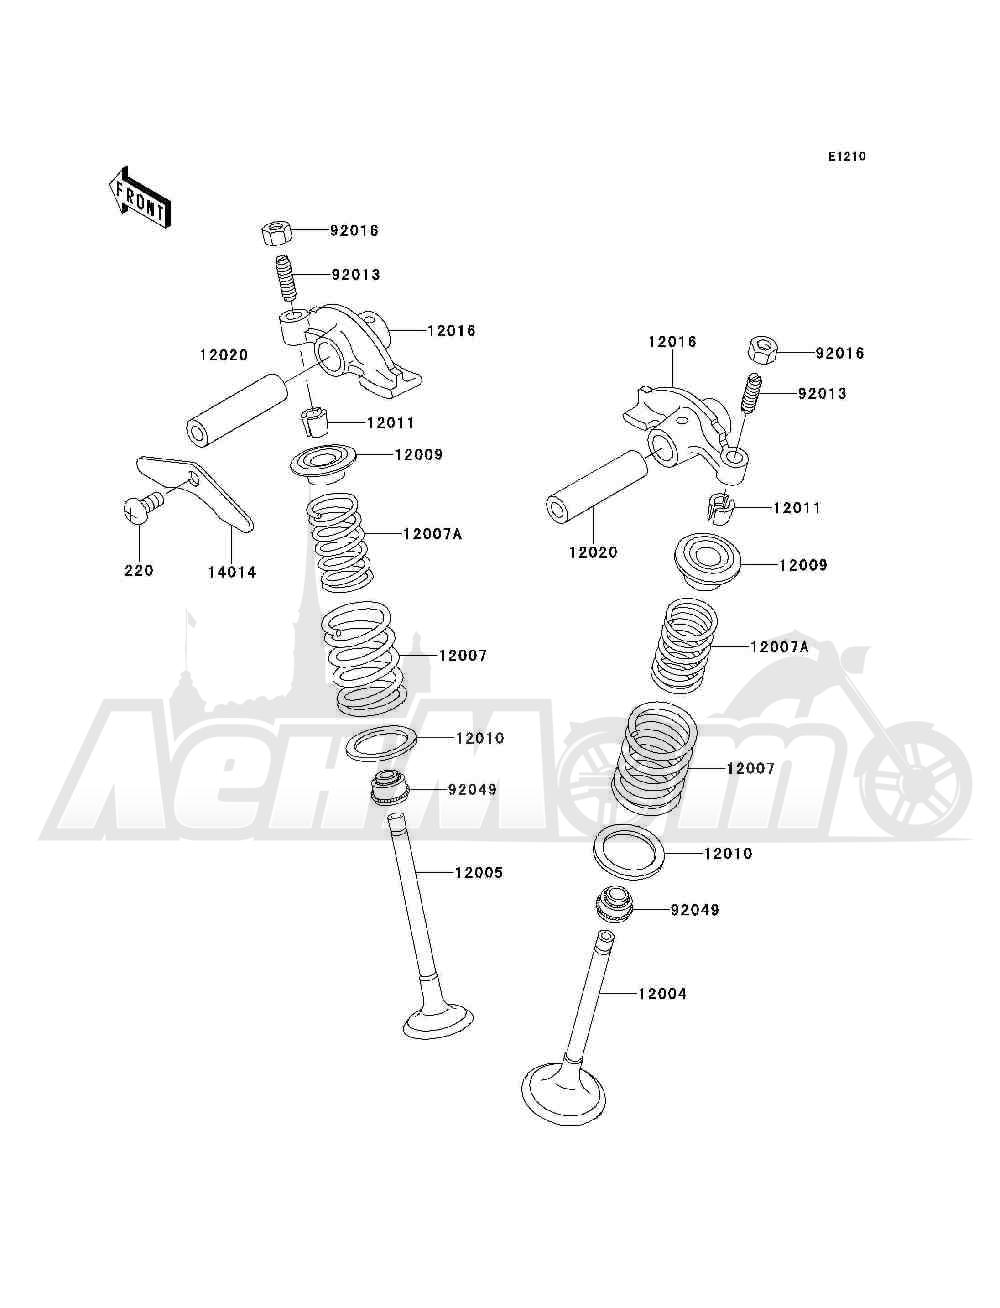 Запчасти для Квадроцикла Kawasaki 1994 BAYOU 300 4X4 (KLF300-C6) Раздел: VALVE(S) | клапан (S)